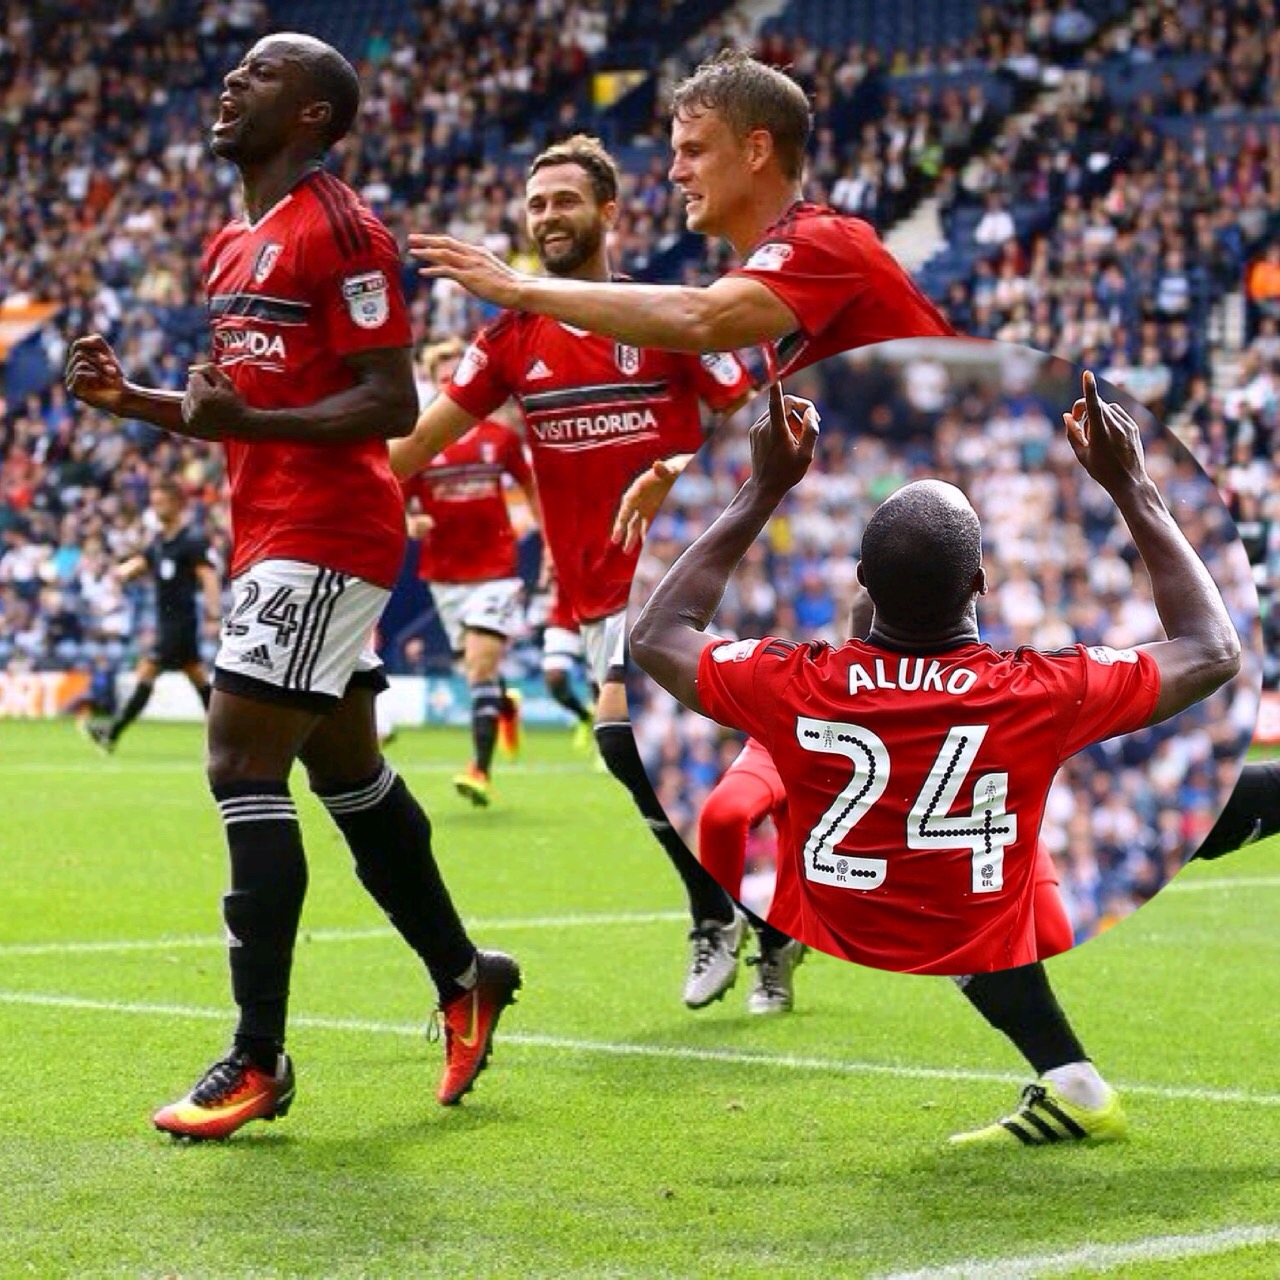 Aluko Targets Away Win With Fulham Vs Wigan